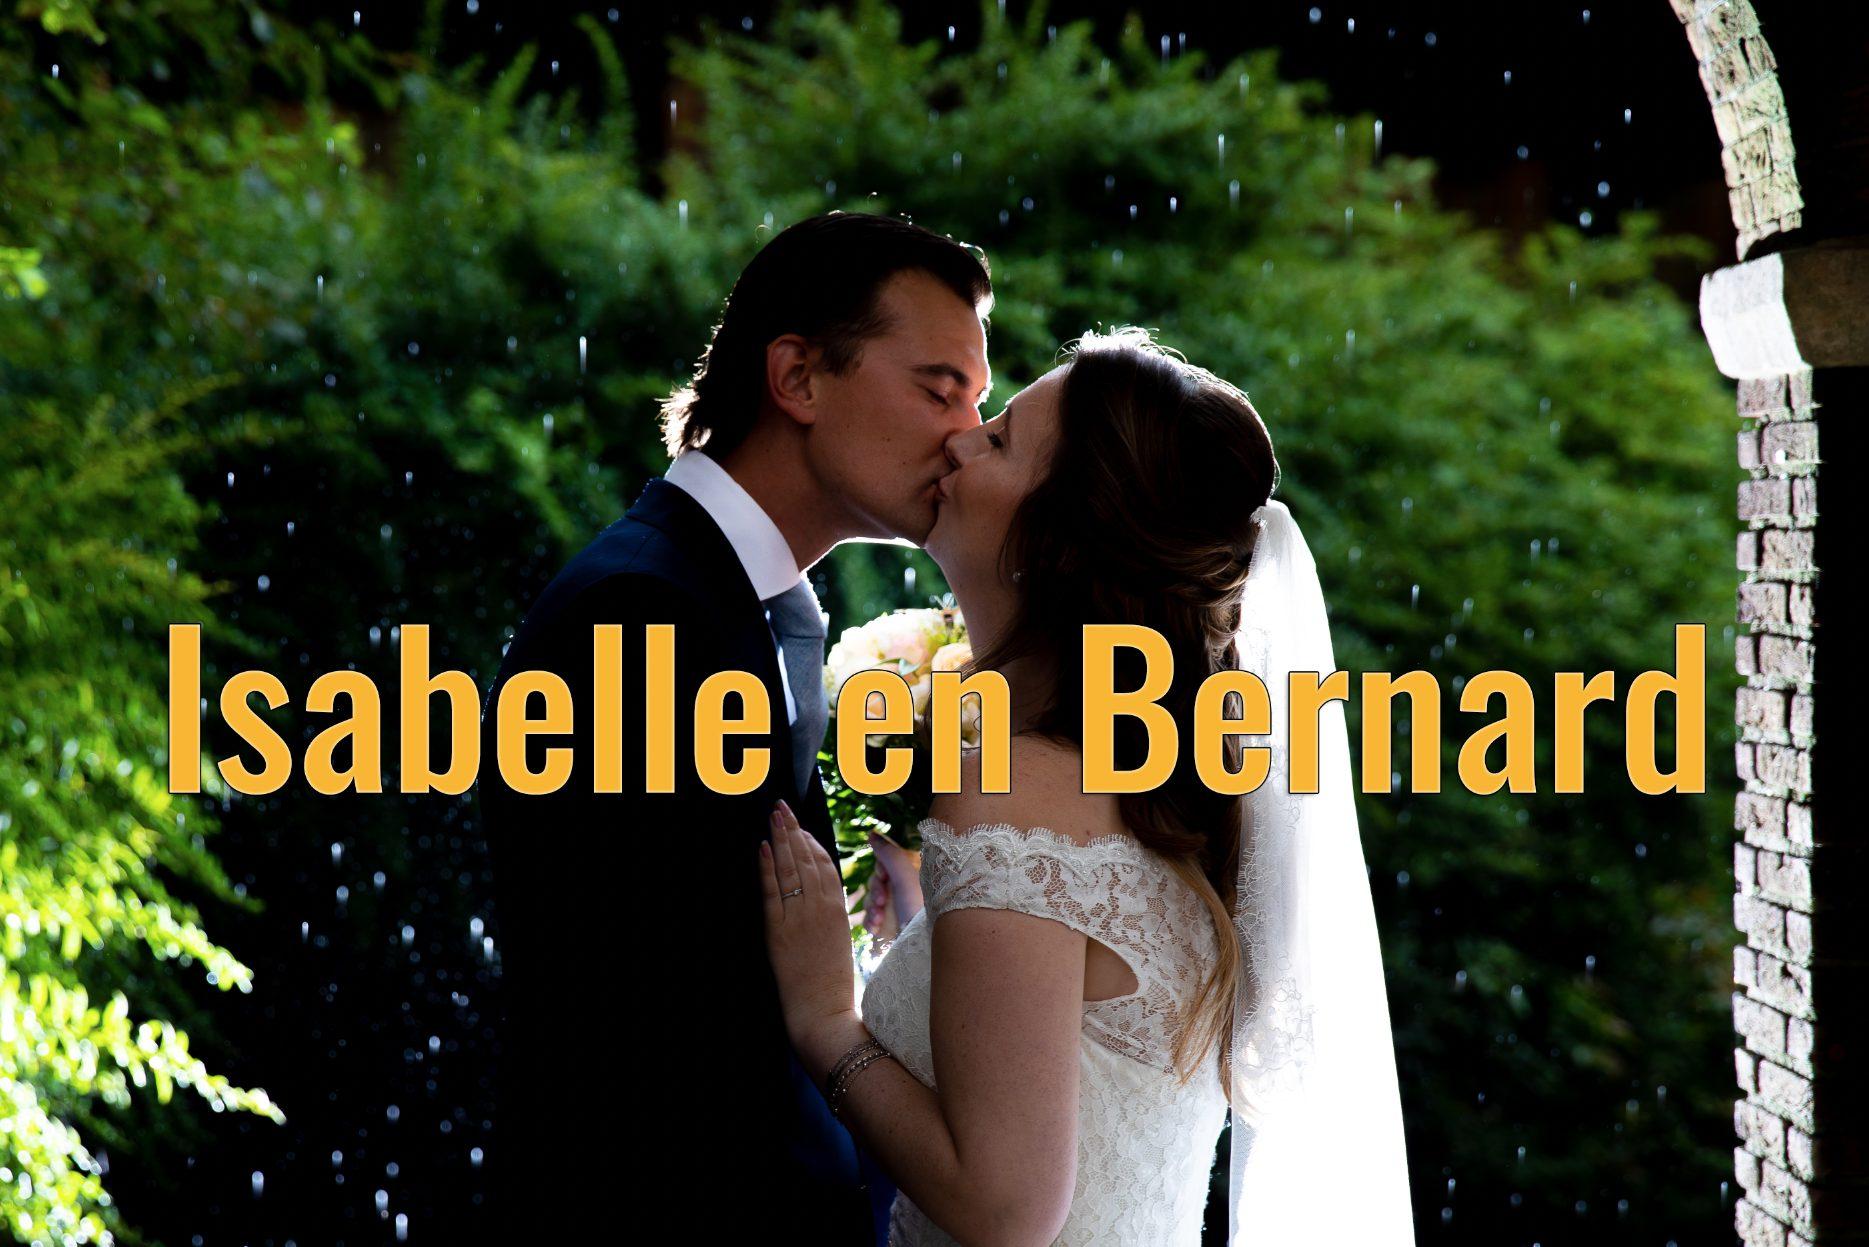 Isabelle en Bernard